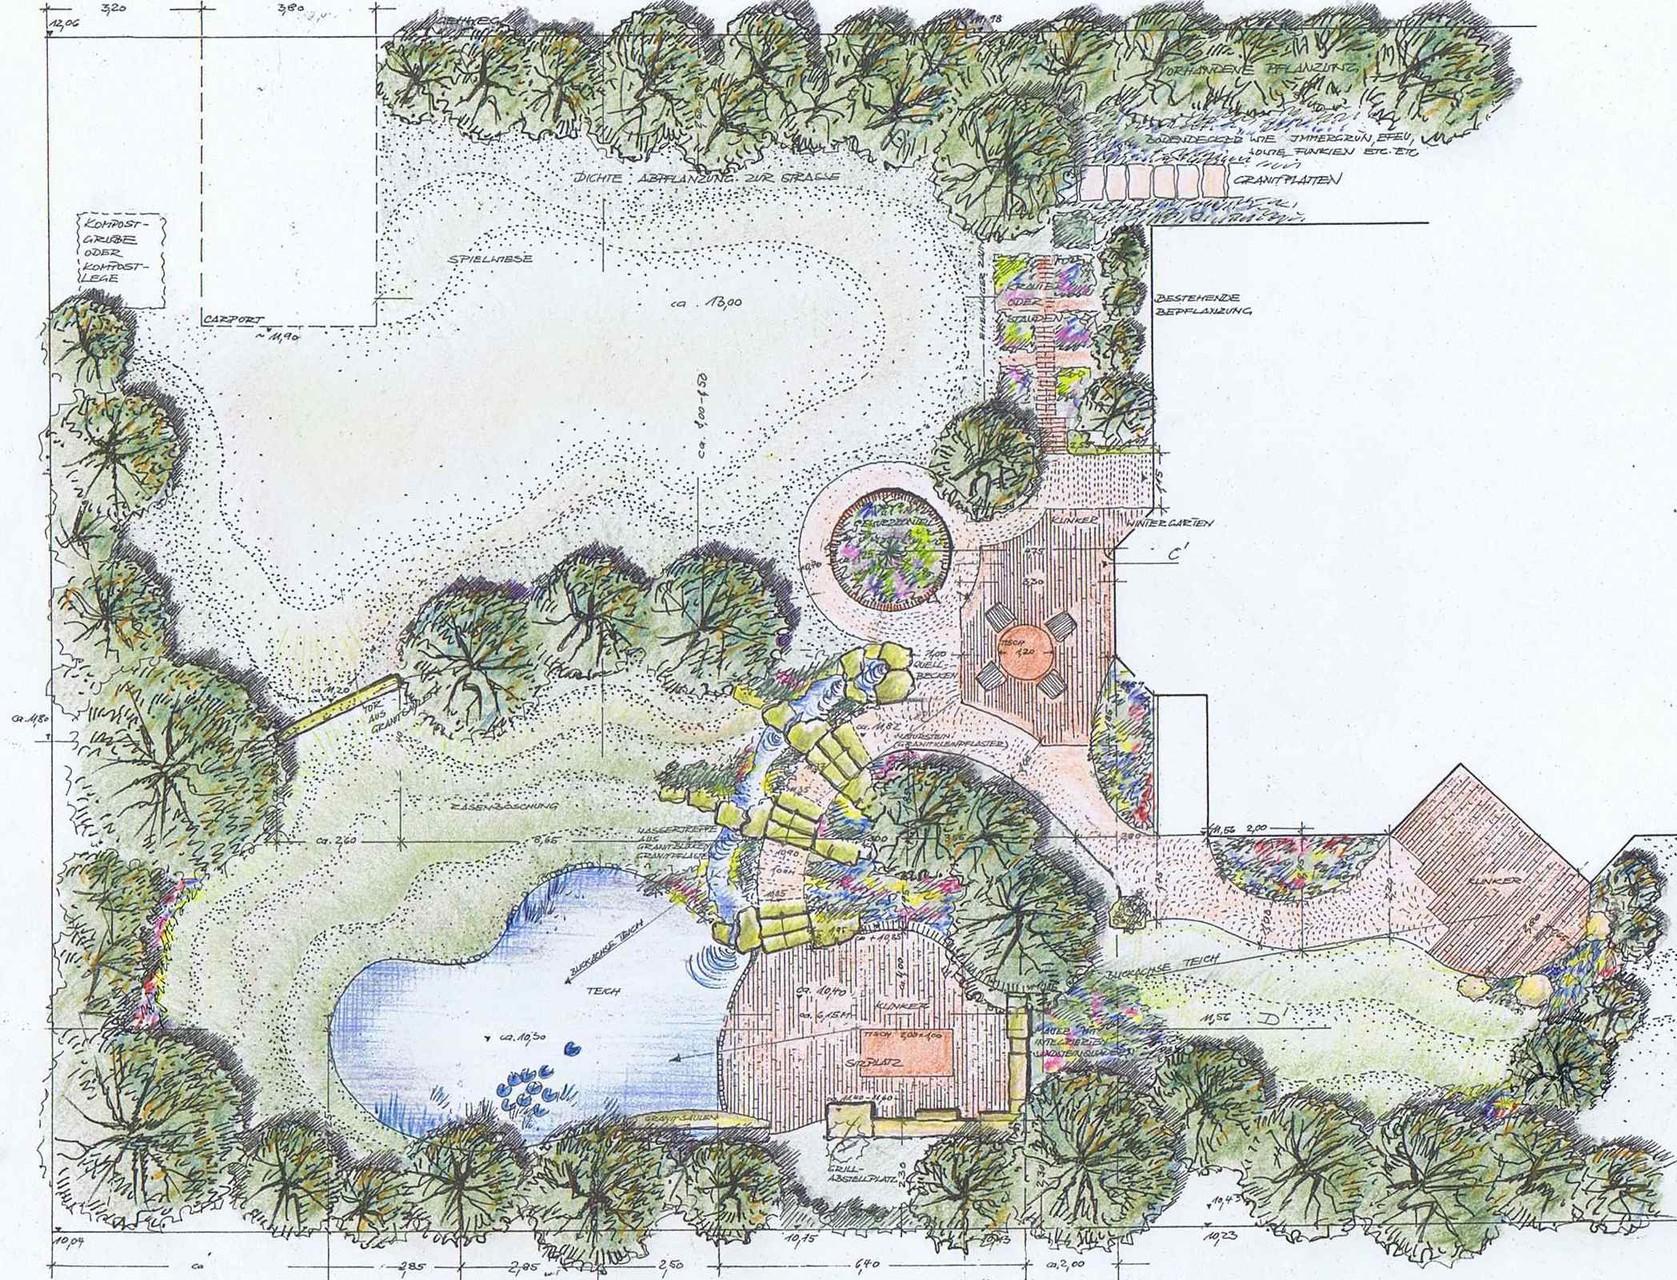 Hausgartenplanung, colorierter Entwurf